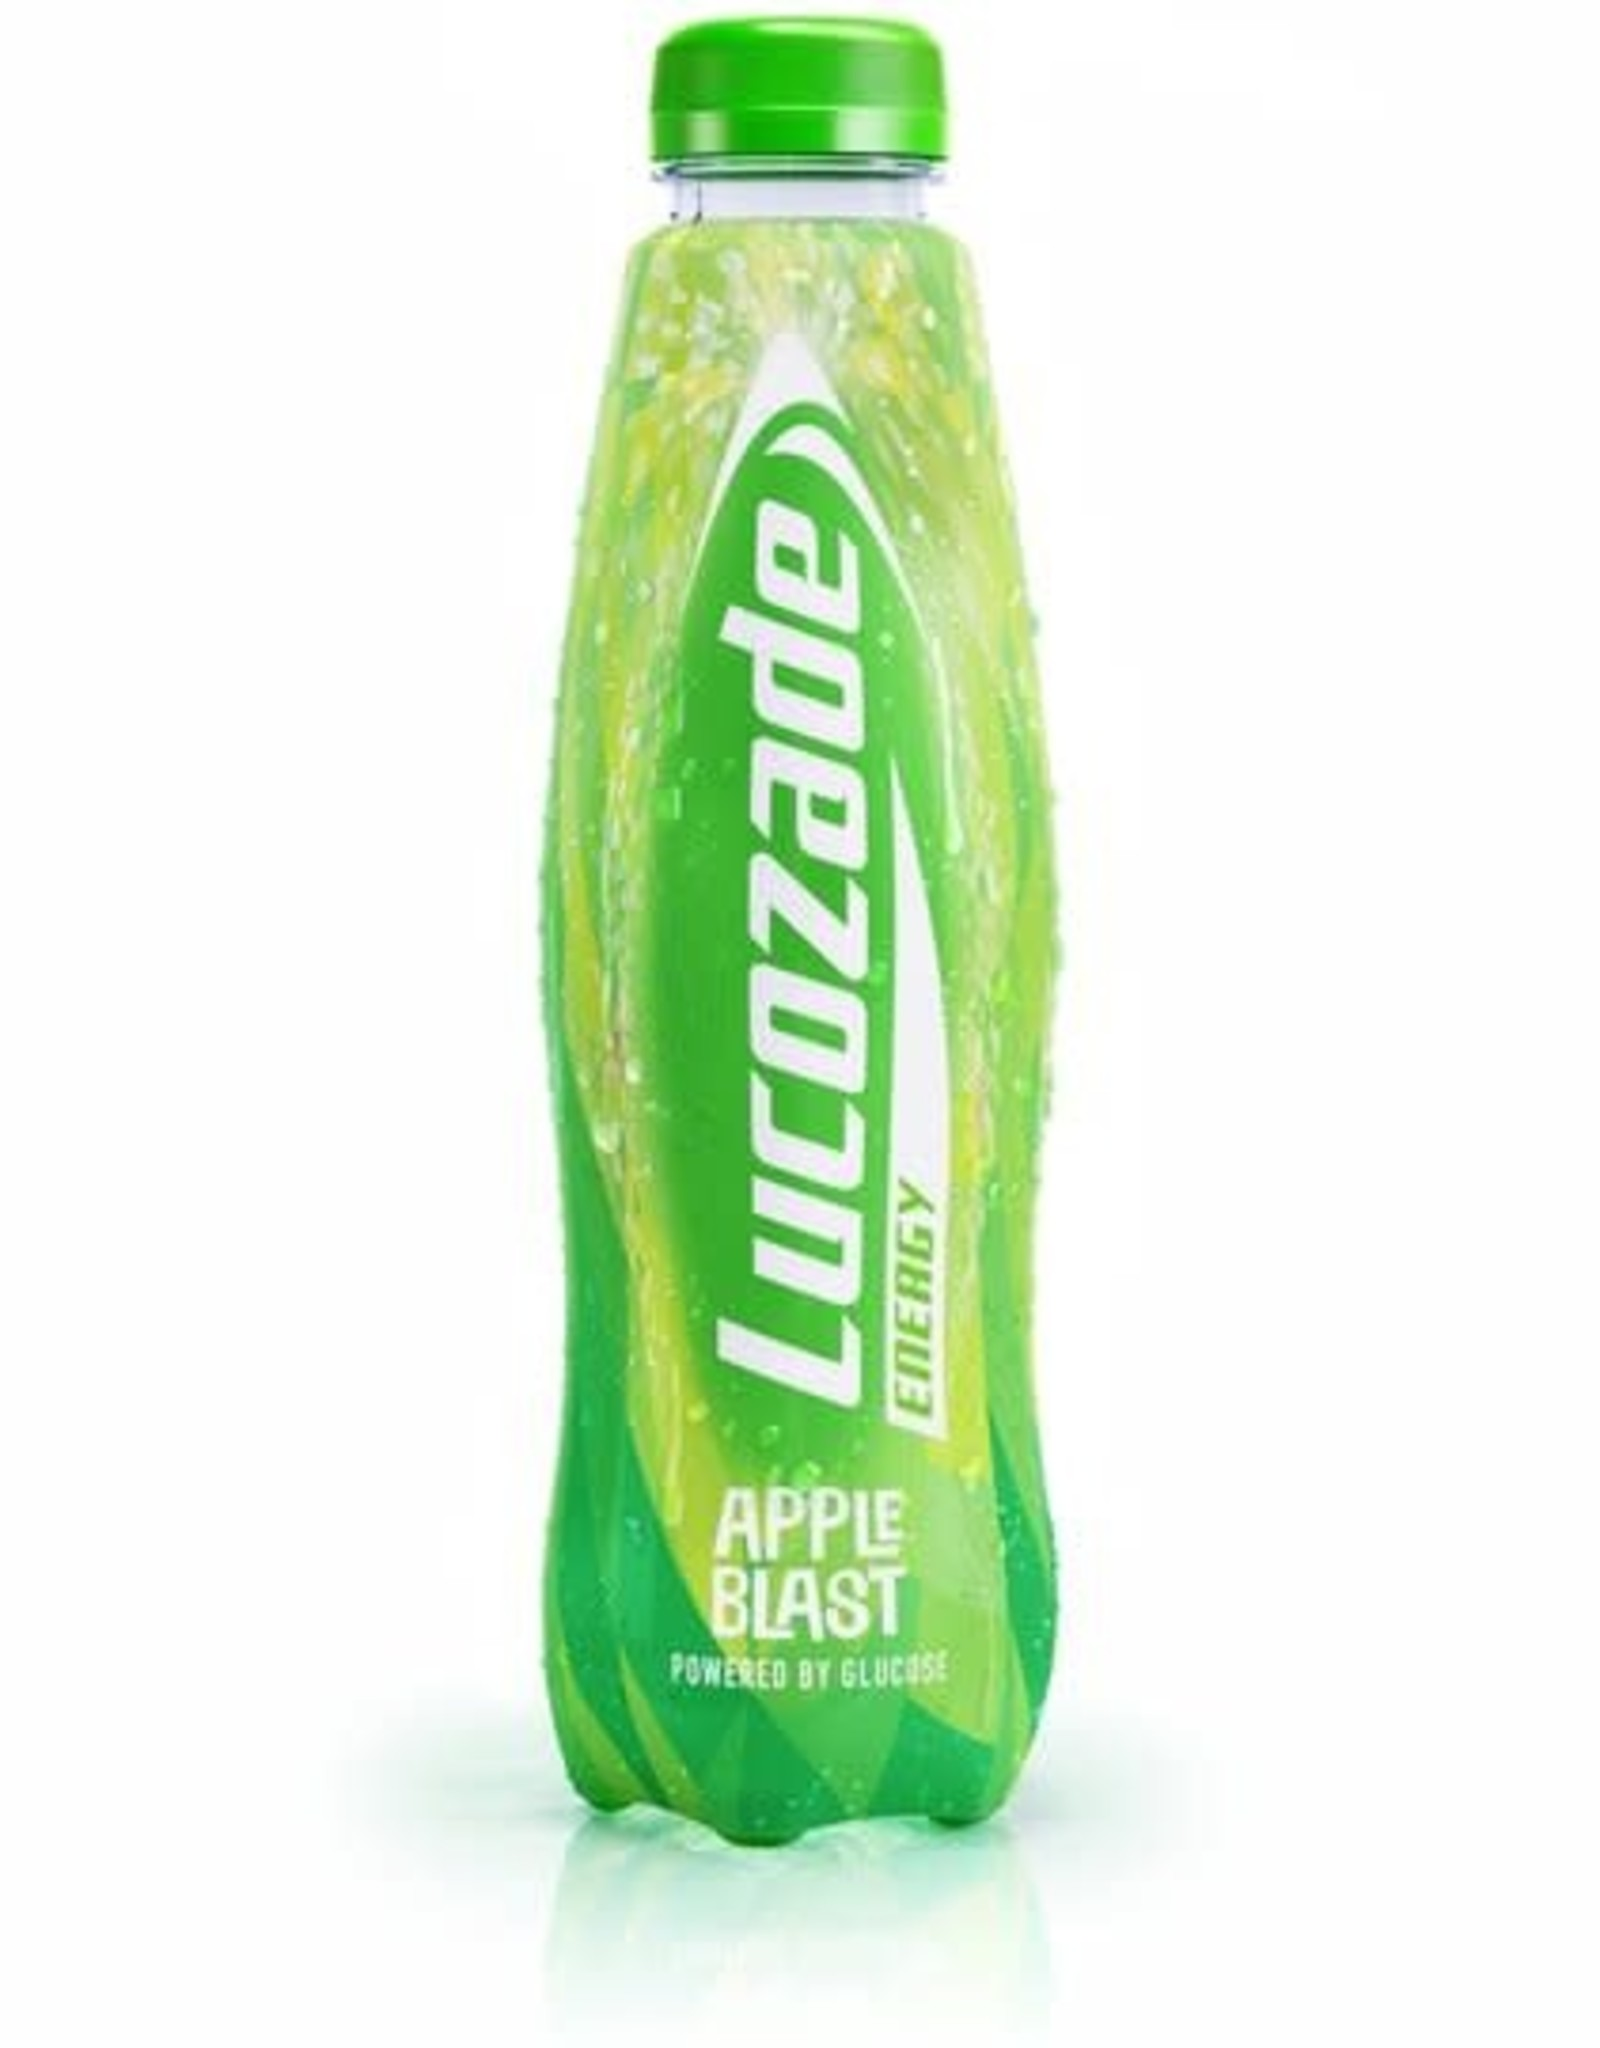 Lucozade Copy of Lucozade Orange 38 cl